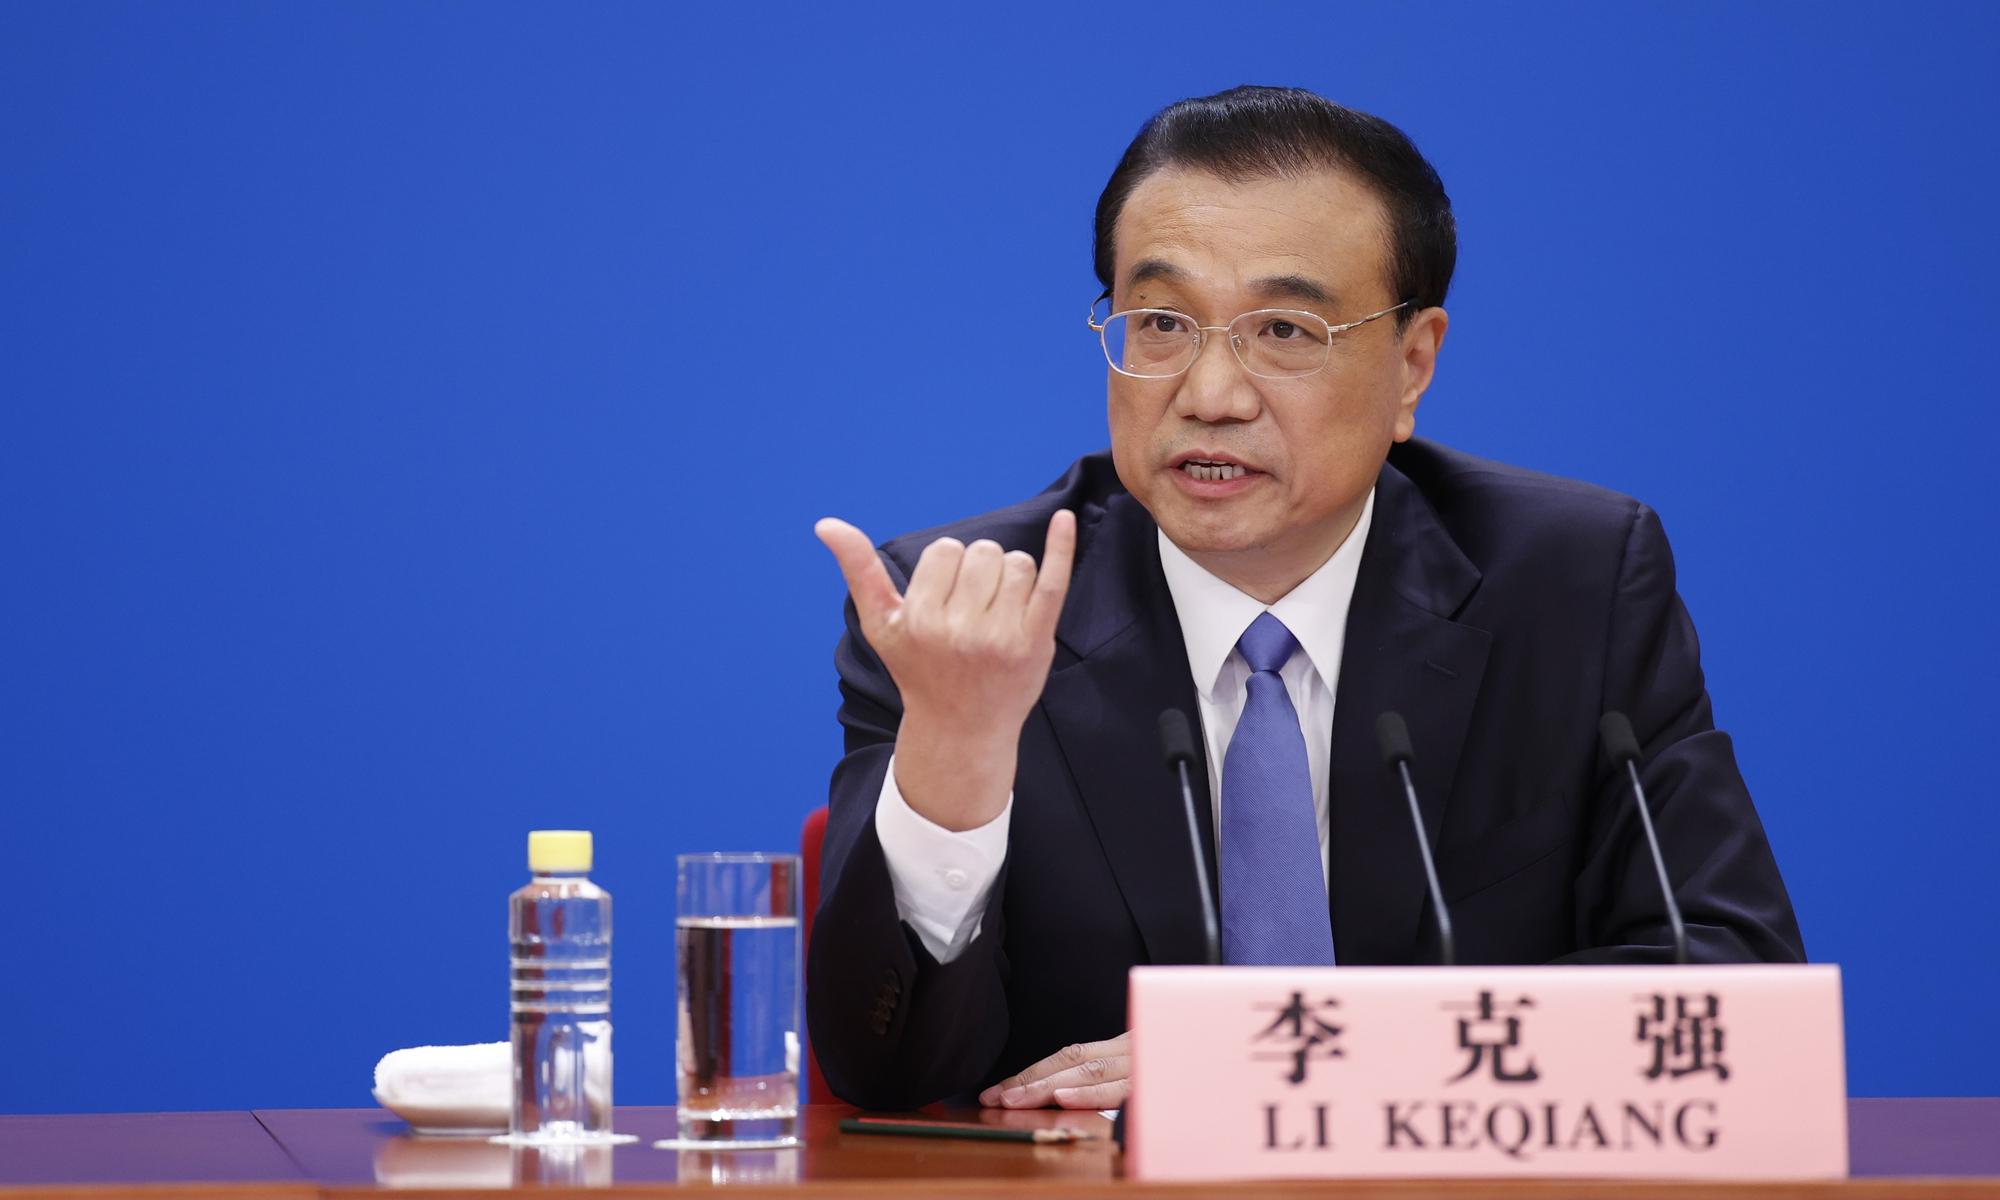 Chinese Premier Li Keqiang gestures a